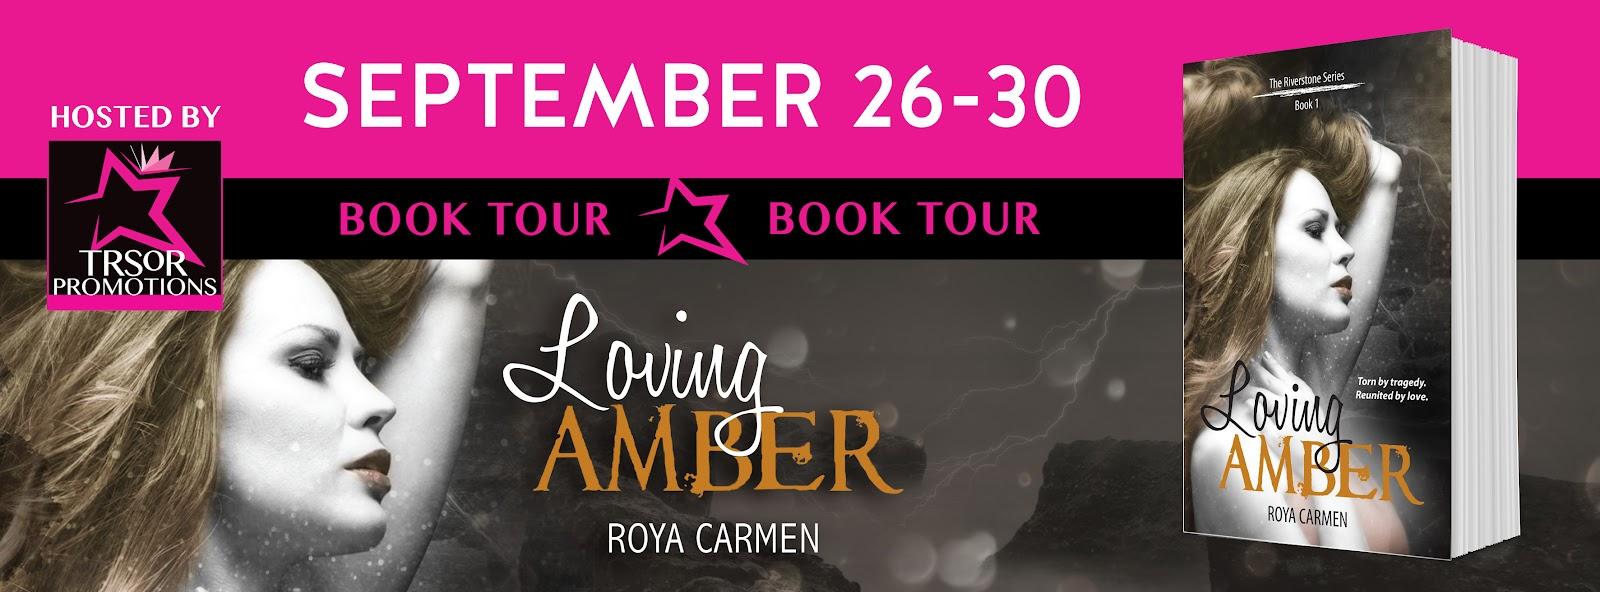 LOVING_AMBER_BOOK_TOUR.jpg